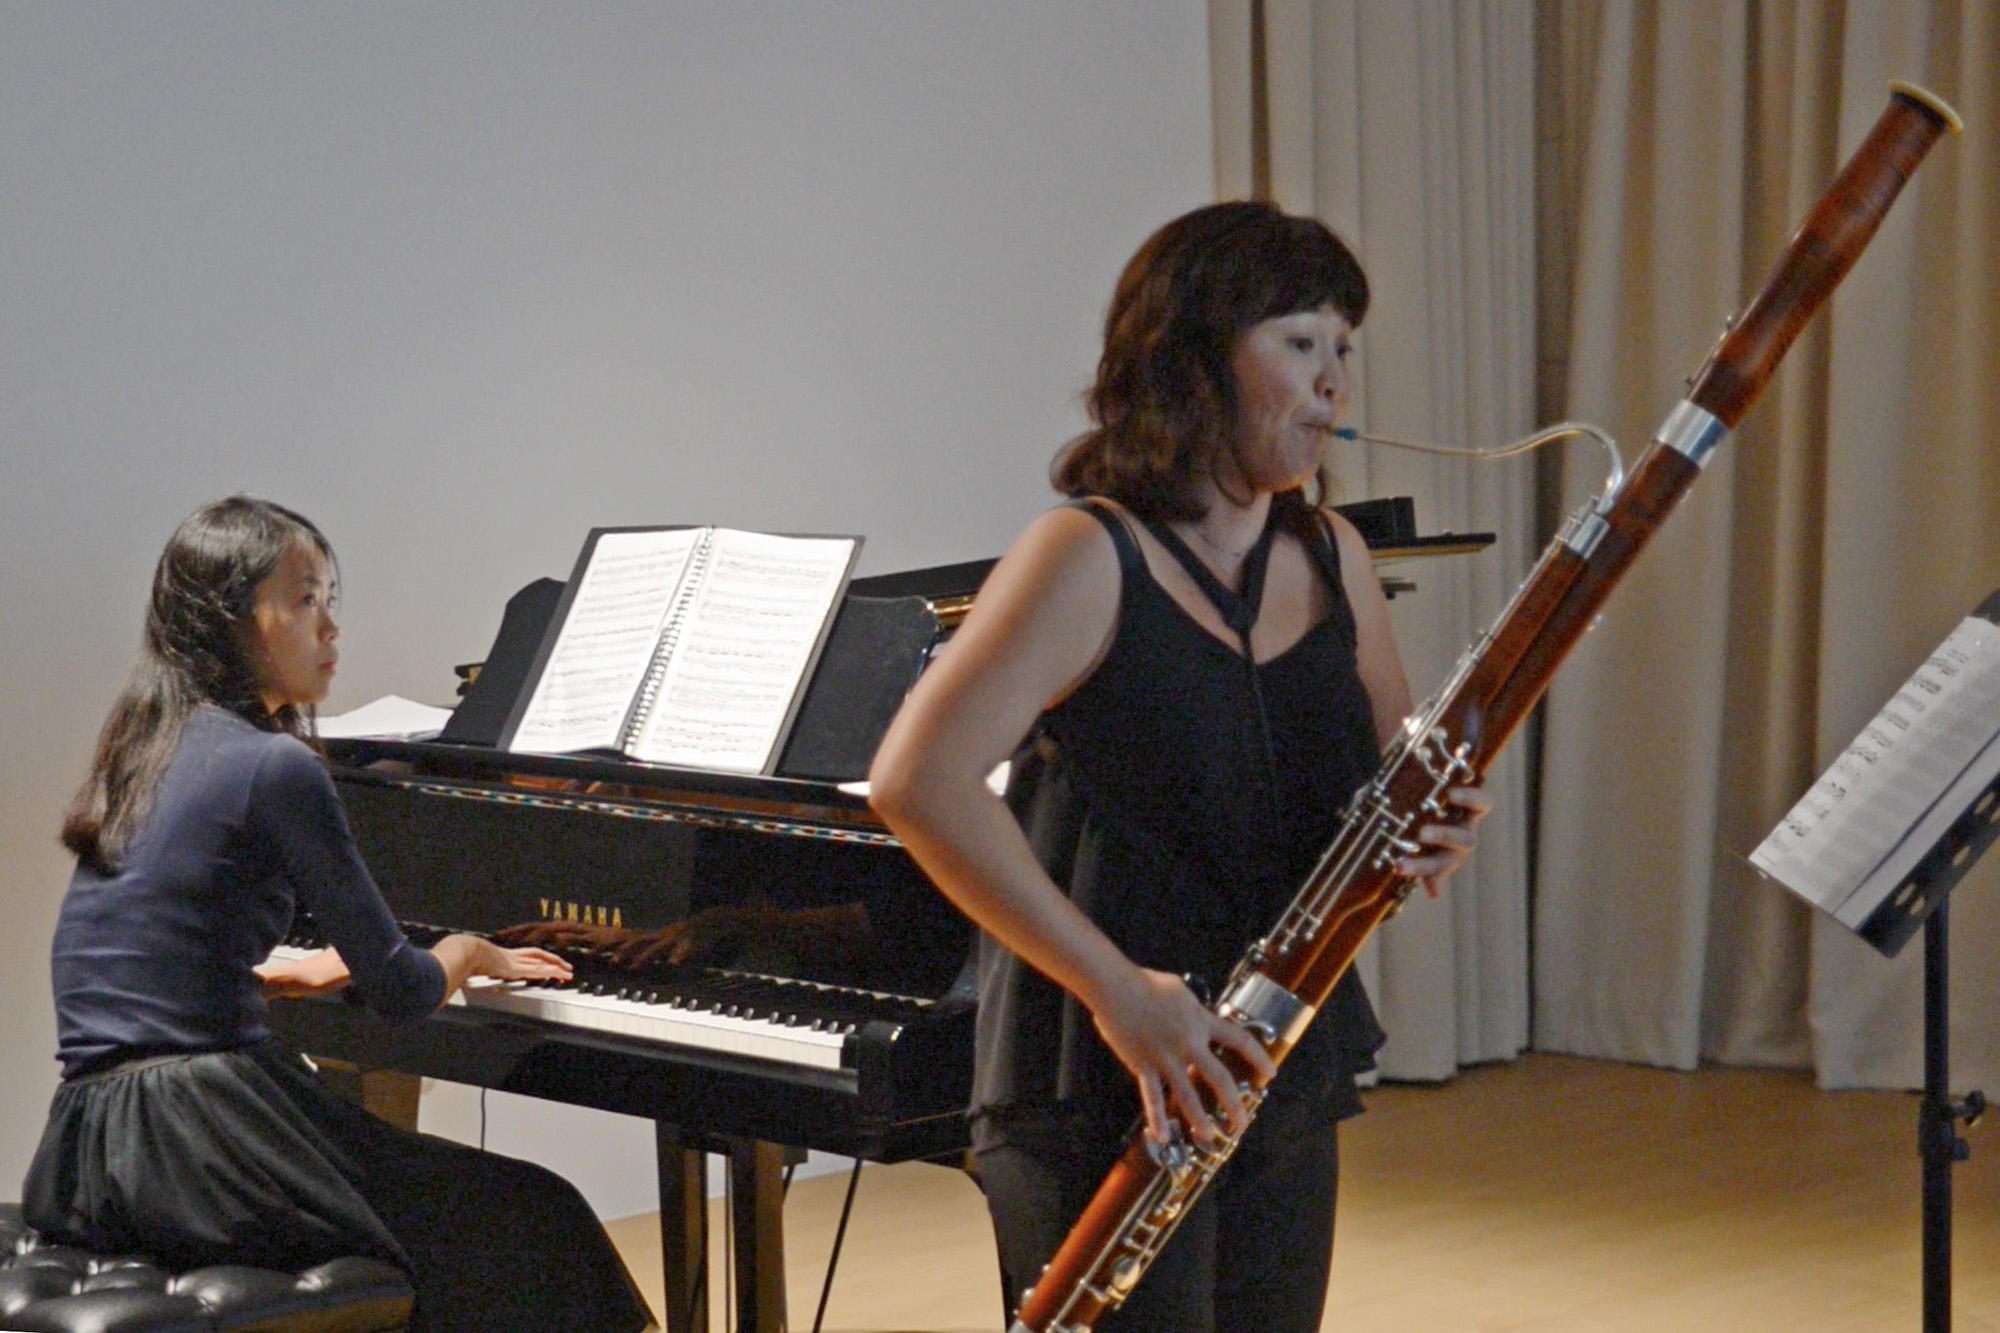 Odyssey - Embark on an epic bassoon journey